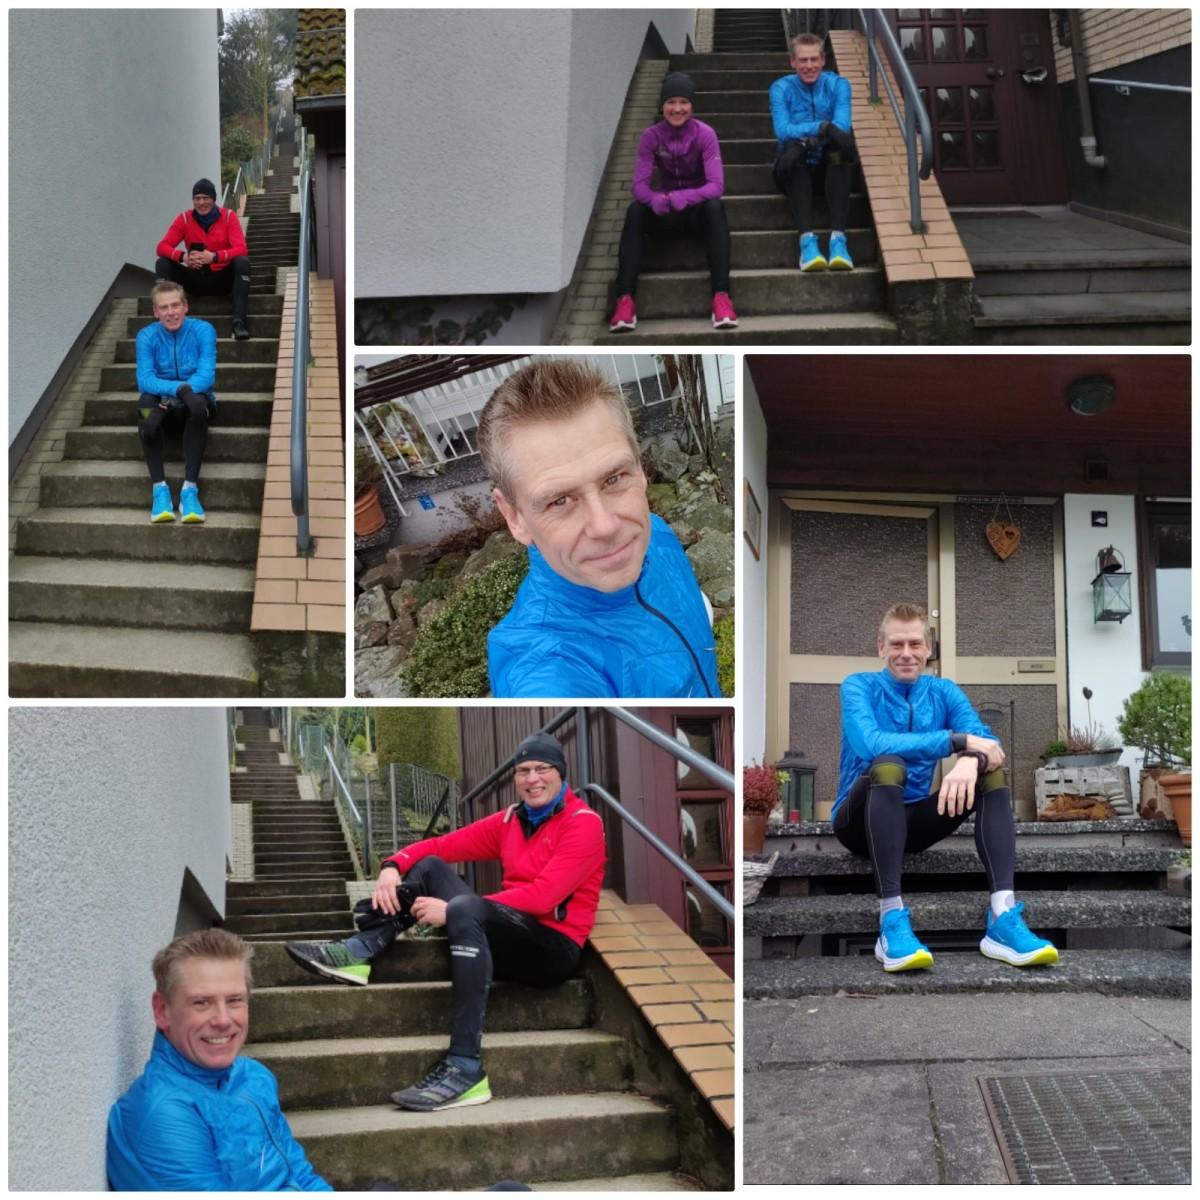 Beimdiek-Klaus-Peter-6-Challenge-Treppenlauf-mcQTx